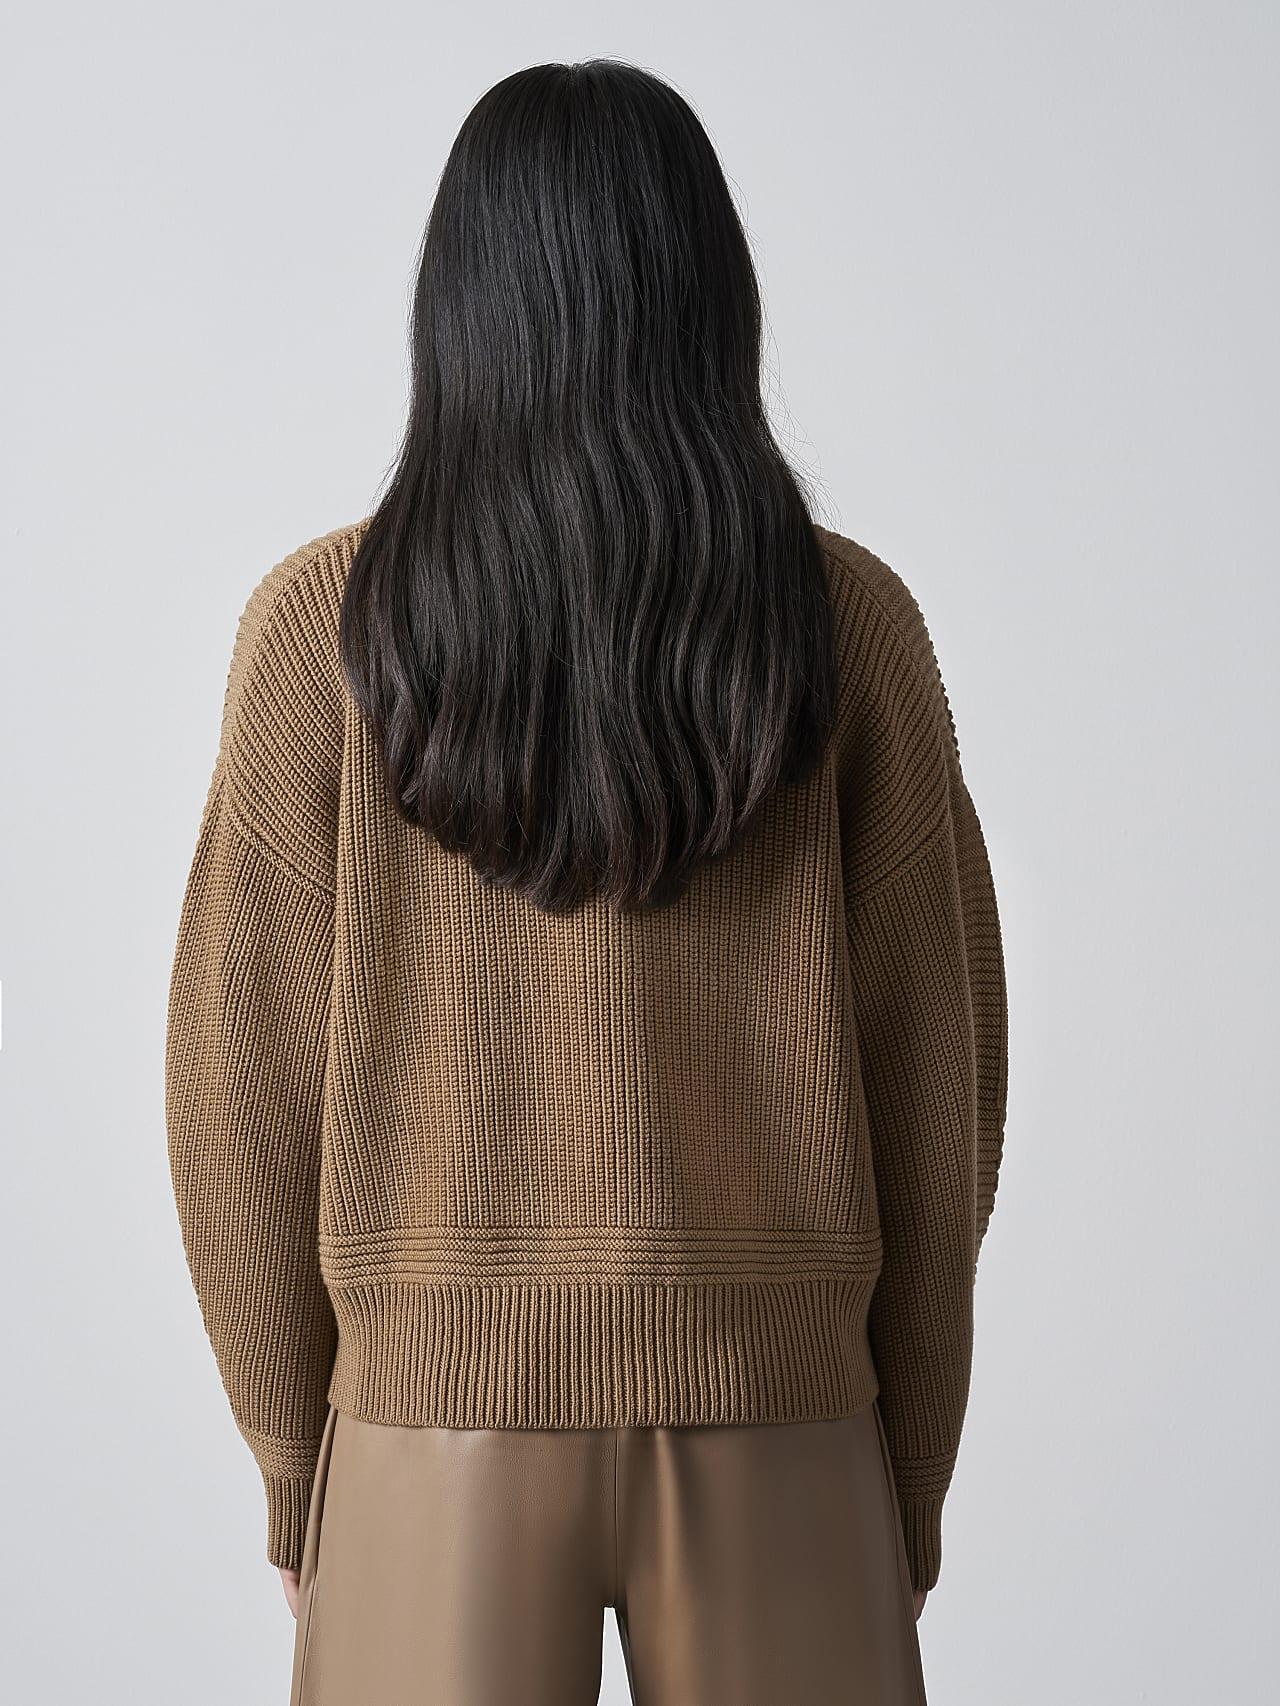 FREDA V1.Y5.02 Chunky Merino Wool Cardigan gold Front Main Alpha Tauri